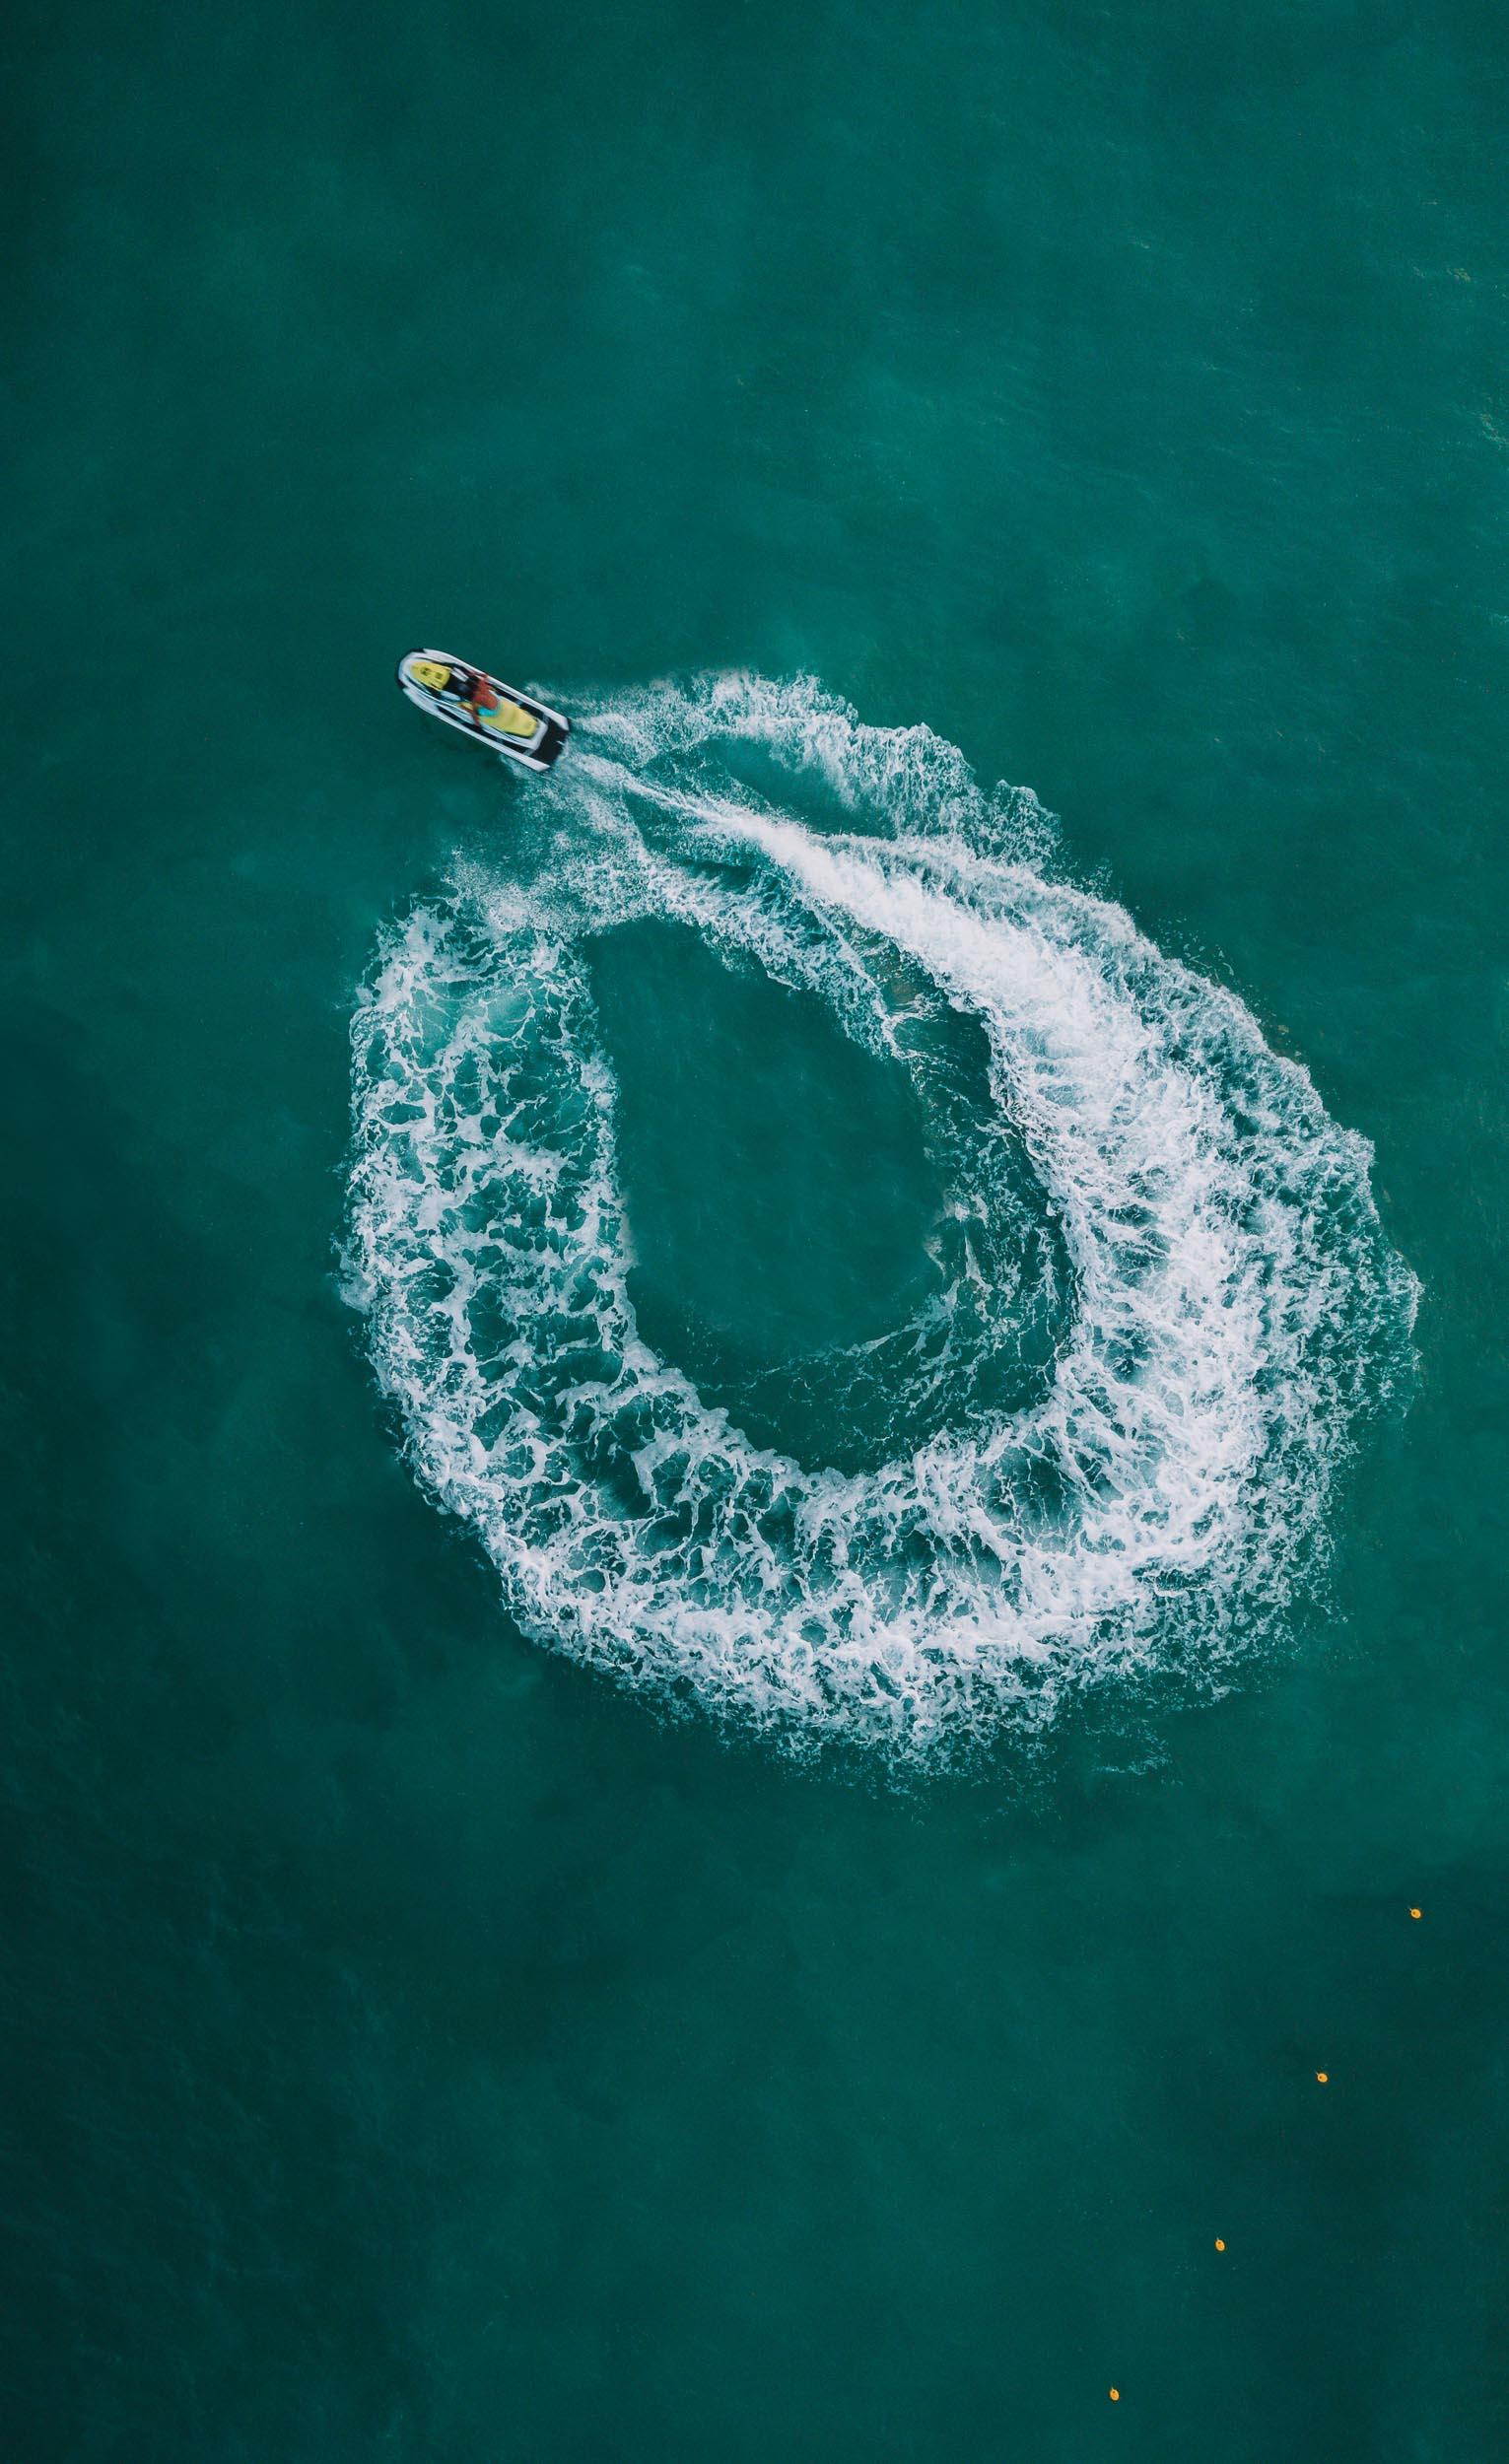 drone-palavaslesflots-jetski-gui2raw-voyage